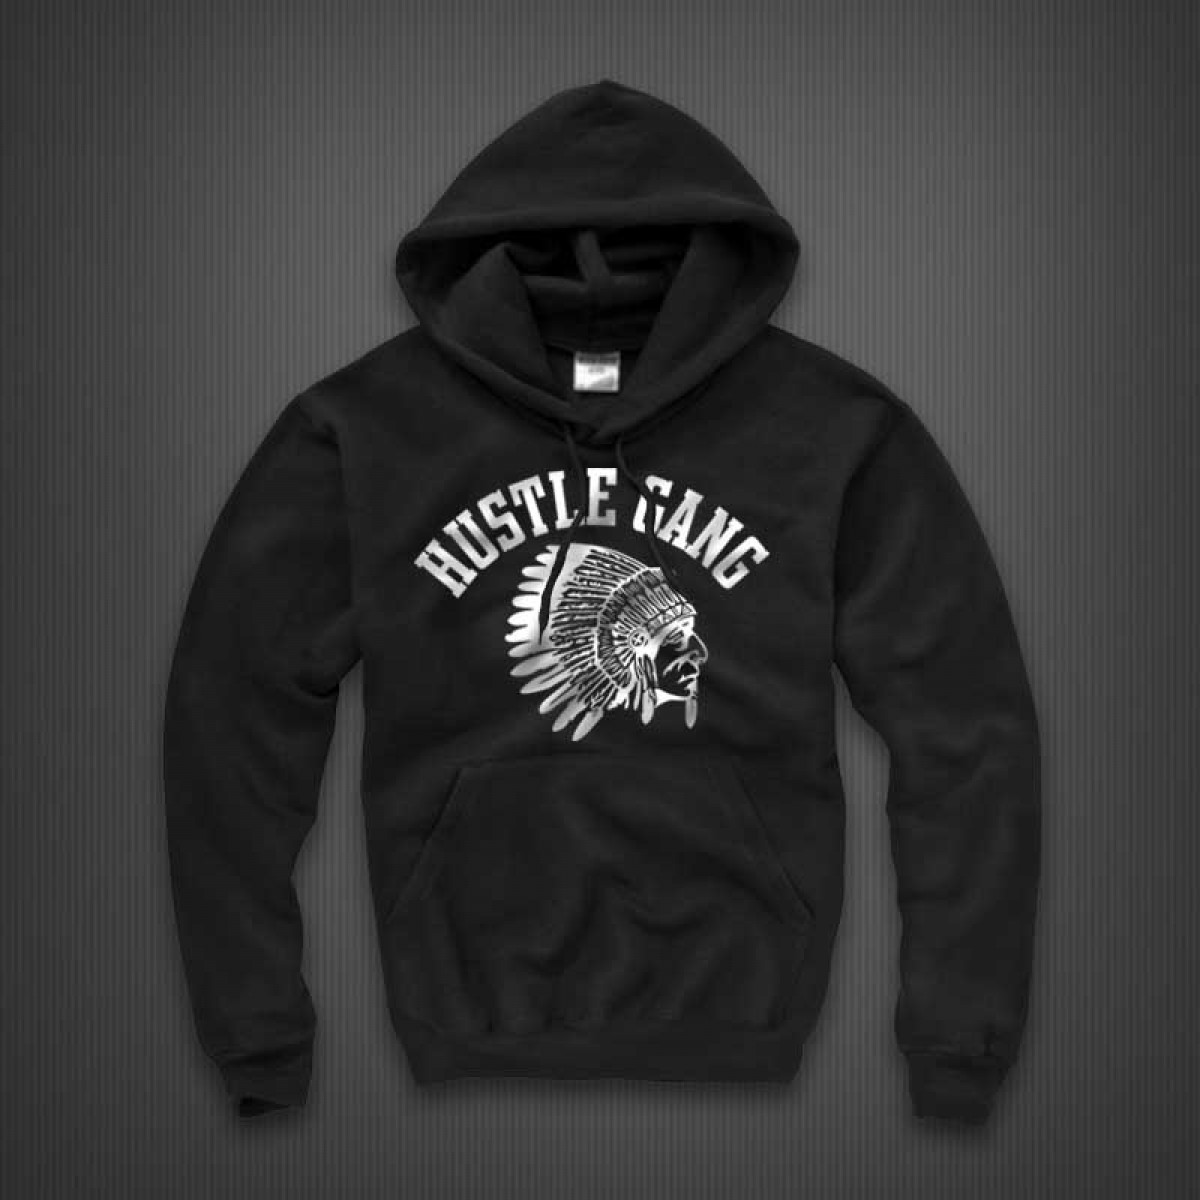 Grand Hustle Logo Hustle gang hoodie by ti 1200x1200